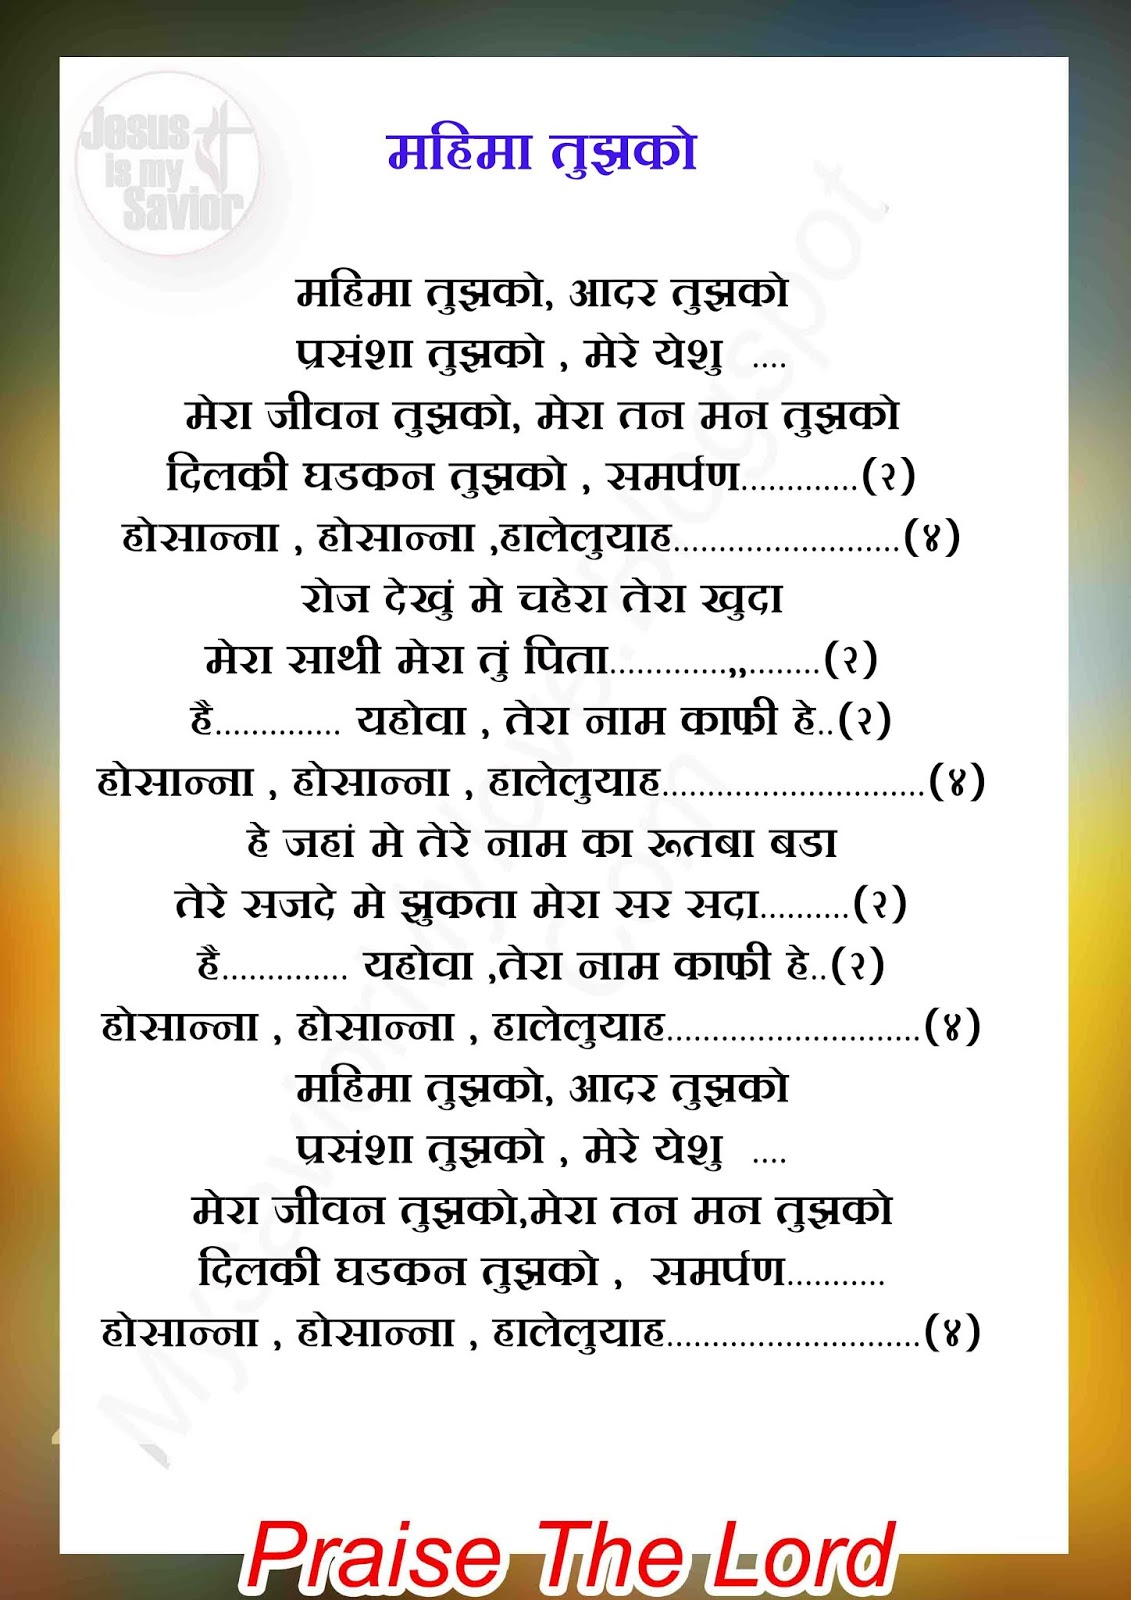 Mahima Tuzako Aadar Tuzako Jesus Hindi Song Lyrics Hindi À¤®à¤¹ À¤® À¤¤ À¤à¤• À¤†à¤¦à¤° À¤¤ À¤à¤• À¤œ À¤¸à¤¸ À¤¸ À¤— À¤² À¤° À¤• À¤¸ New Christian Song S Lyrics Hindi songs lyrics in english. mahima tuzako aadar tuzako jesus